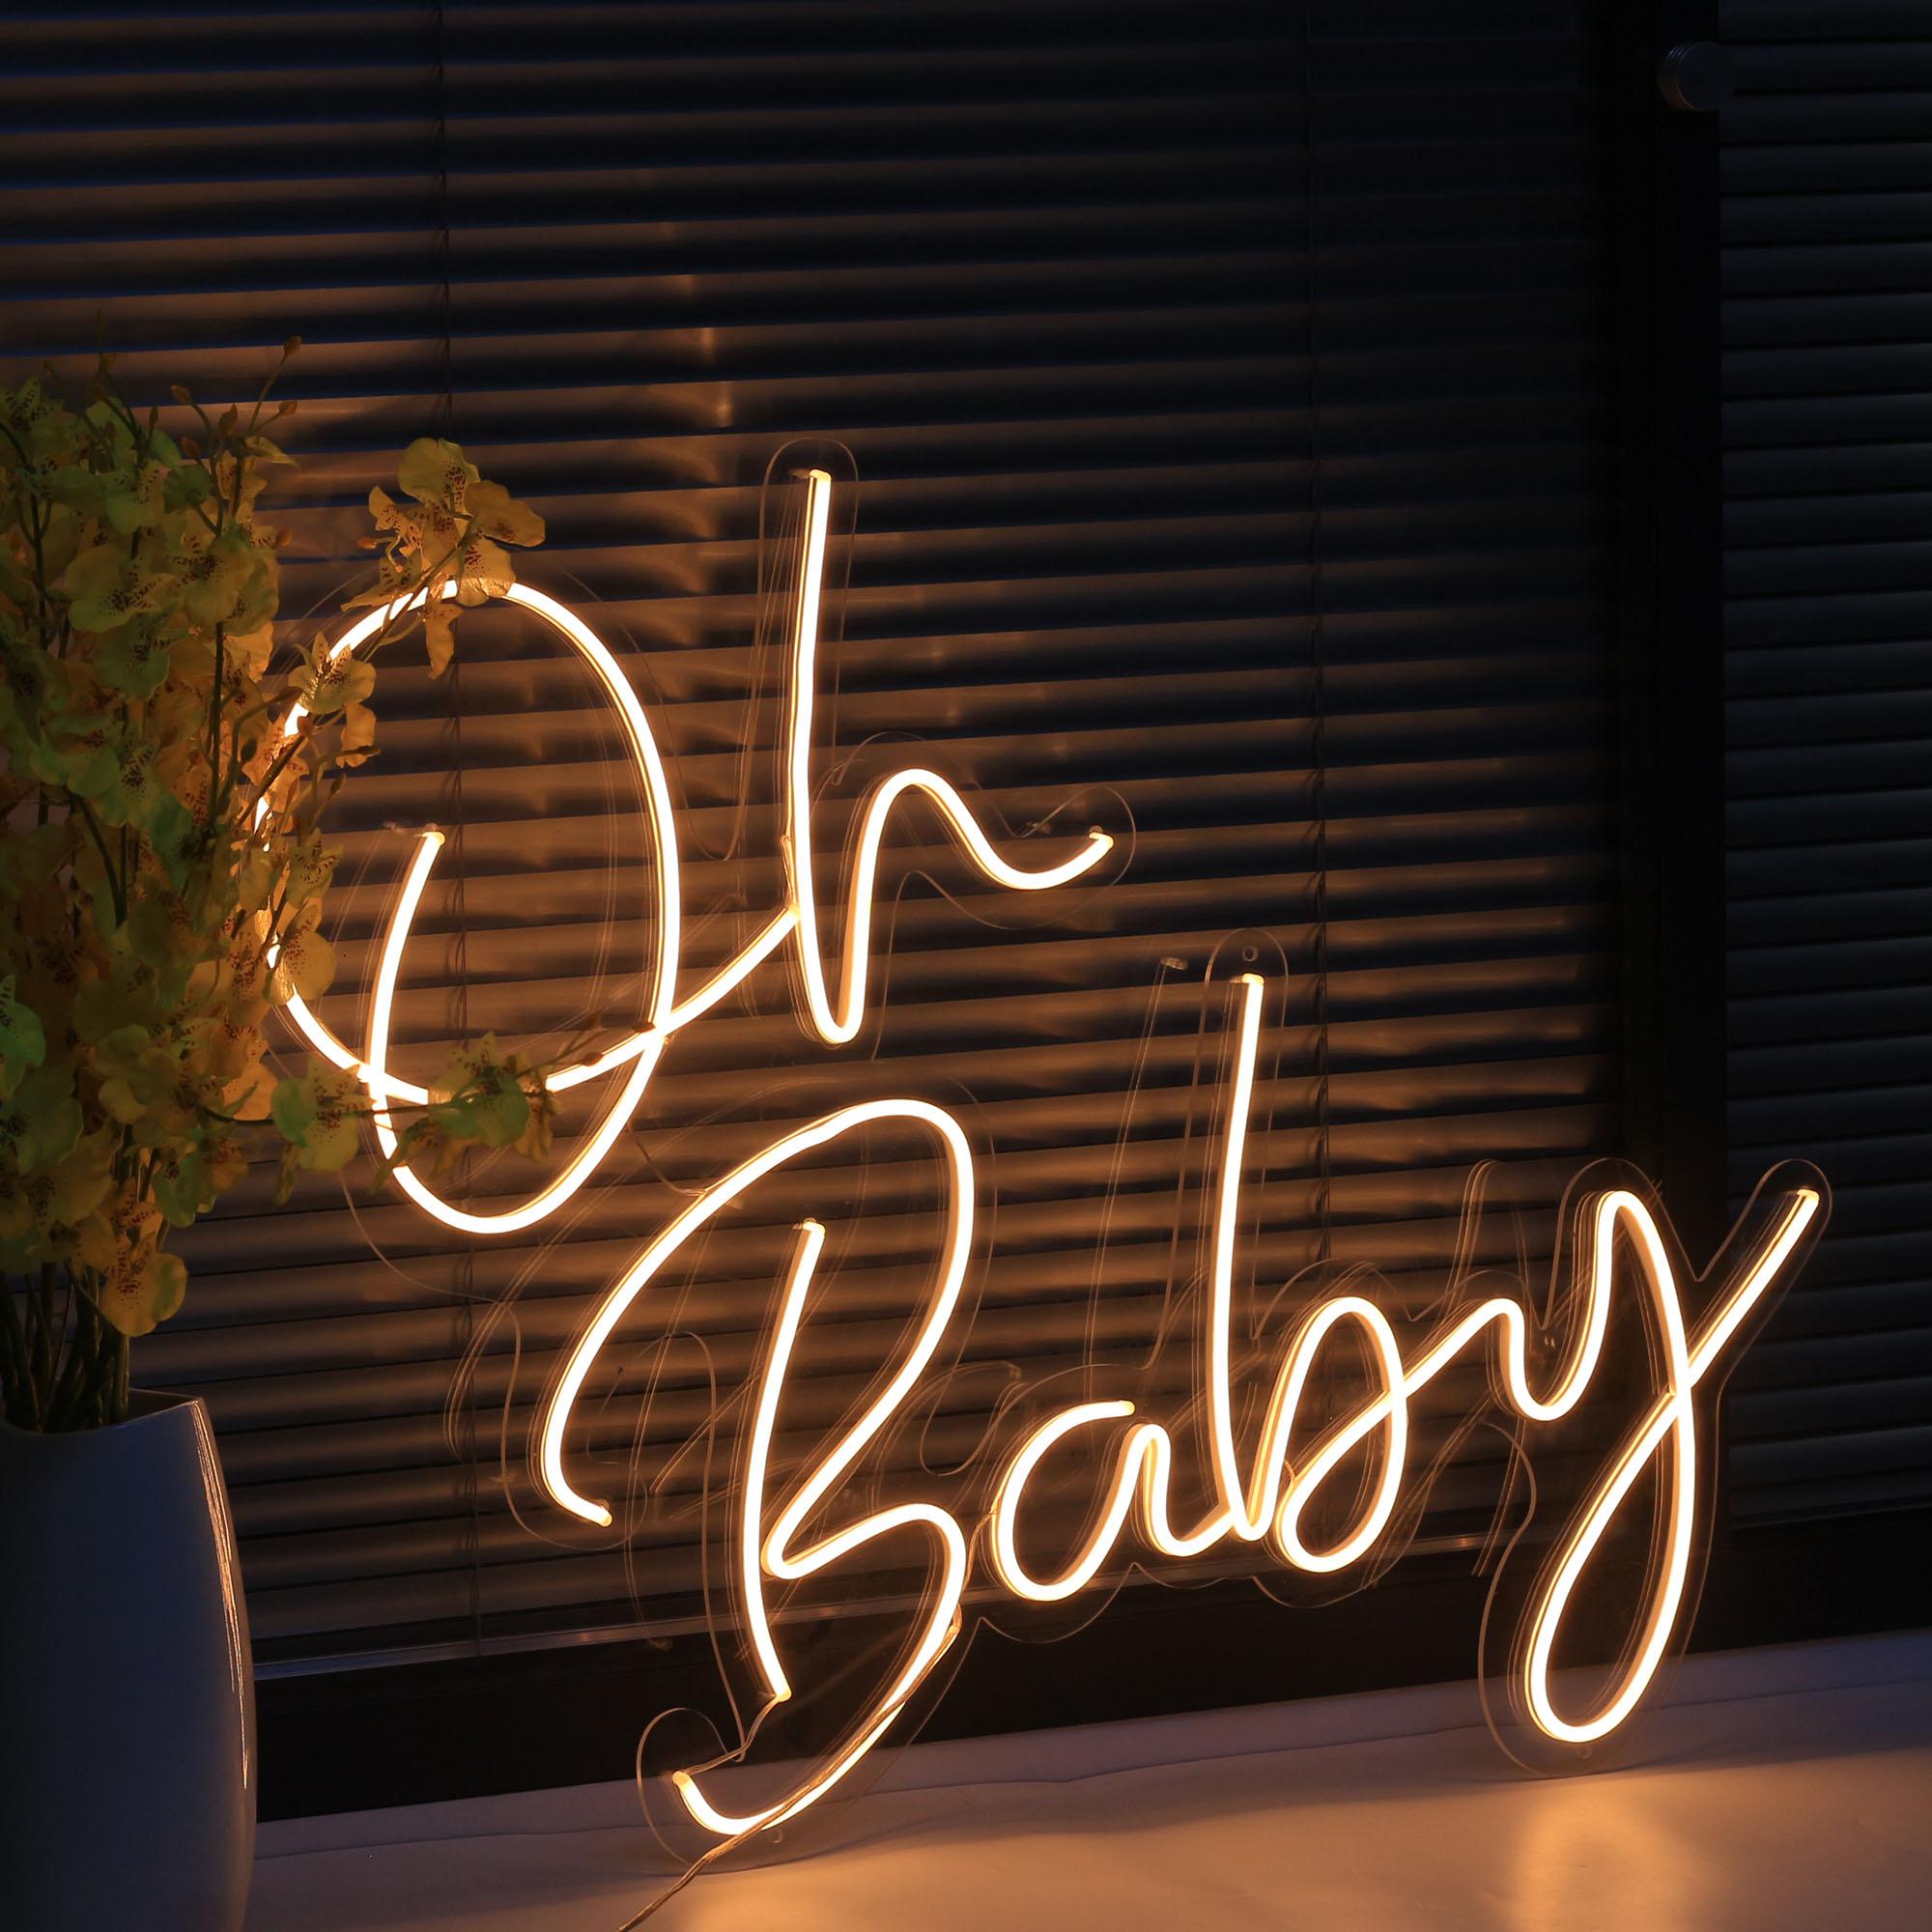 Custom Made Neon Sign Wall Oh Baby LED Light Flex Neon Handmade Beer Bar Shop Logo Pub Store Club Nightclub Decoration